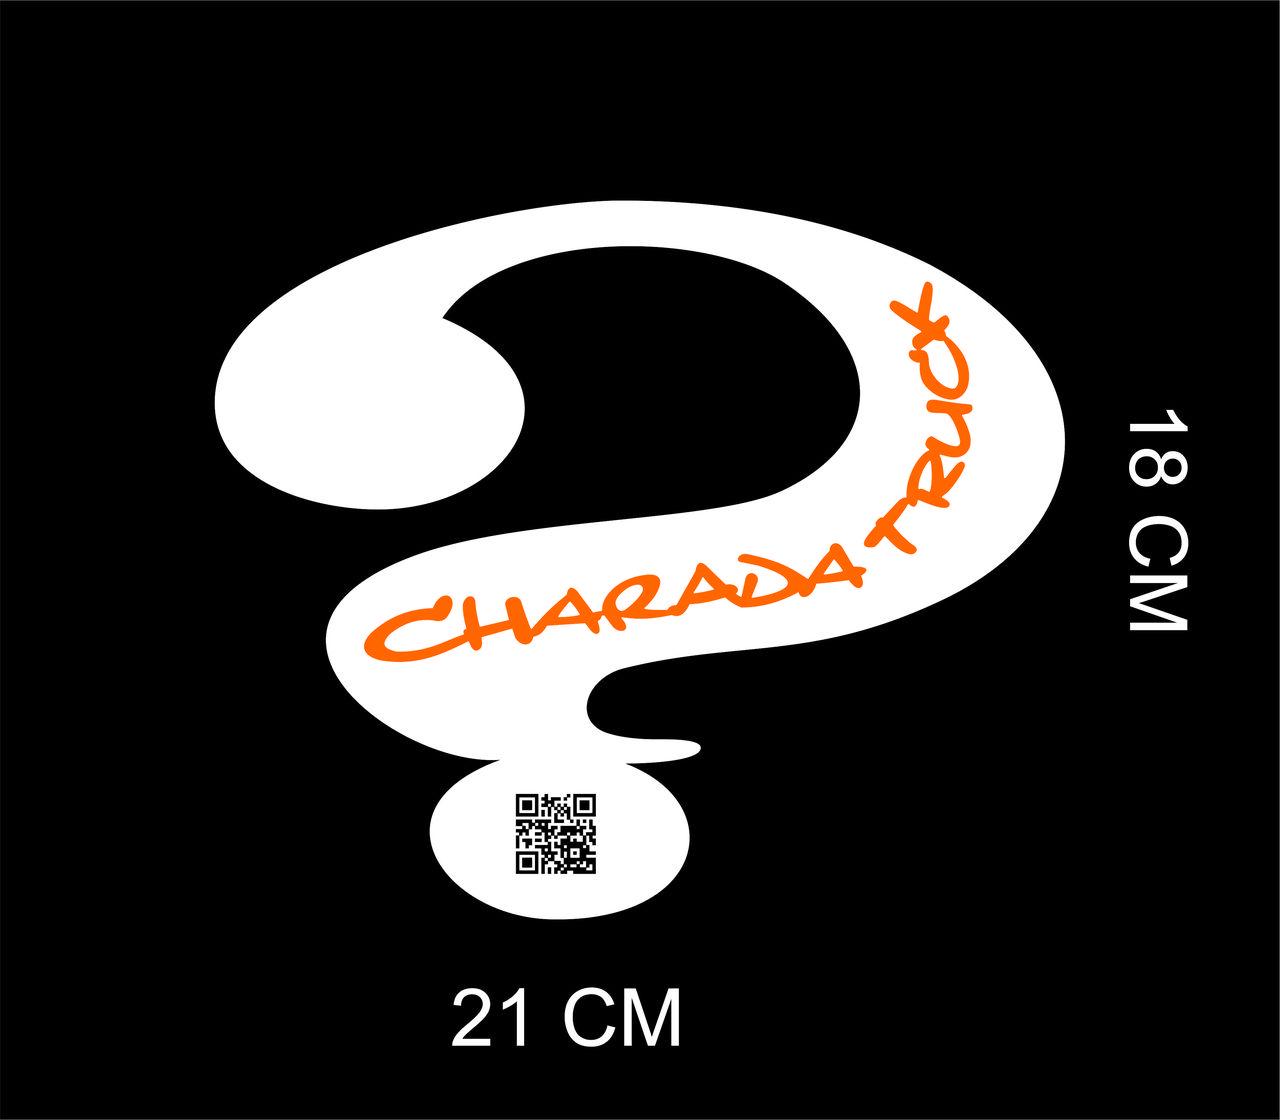 Adesivo Charada Interrogação  QR CODE 18x21cm - BRANCO C/ NOME LARANJA